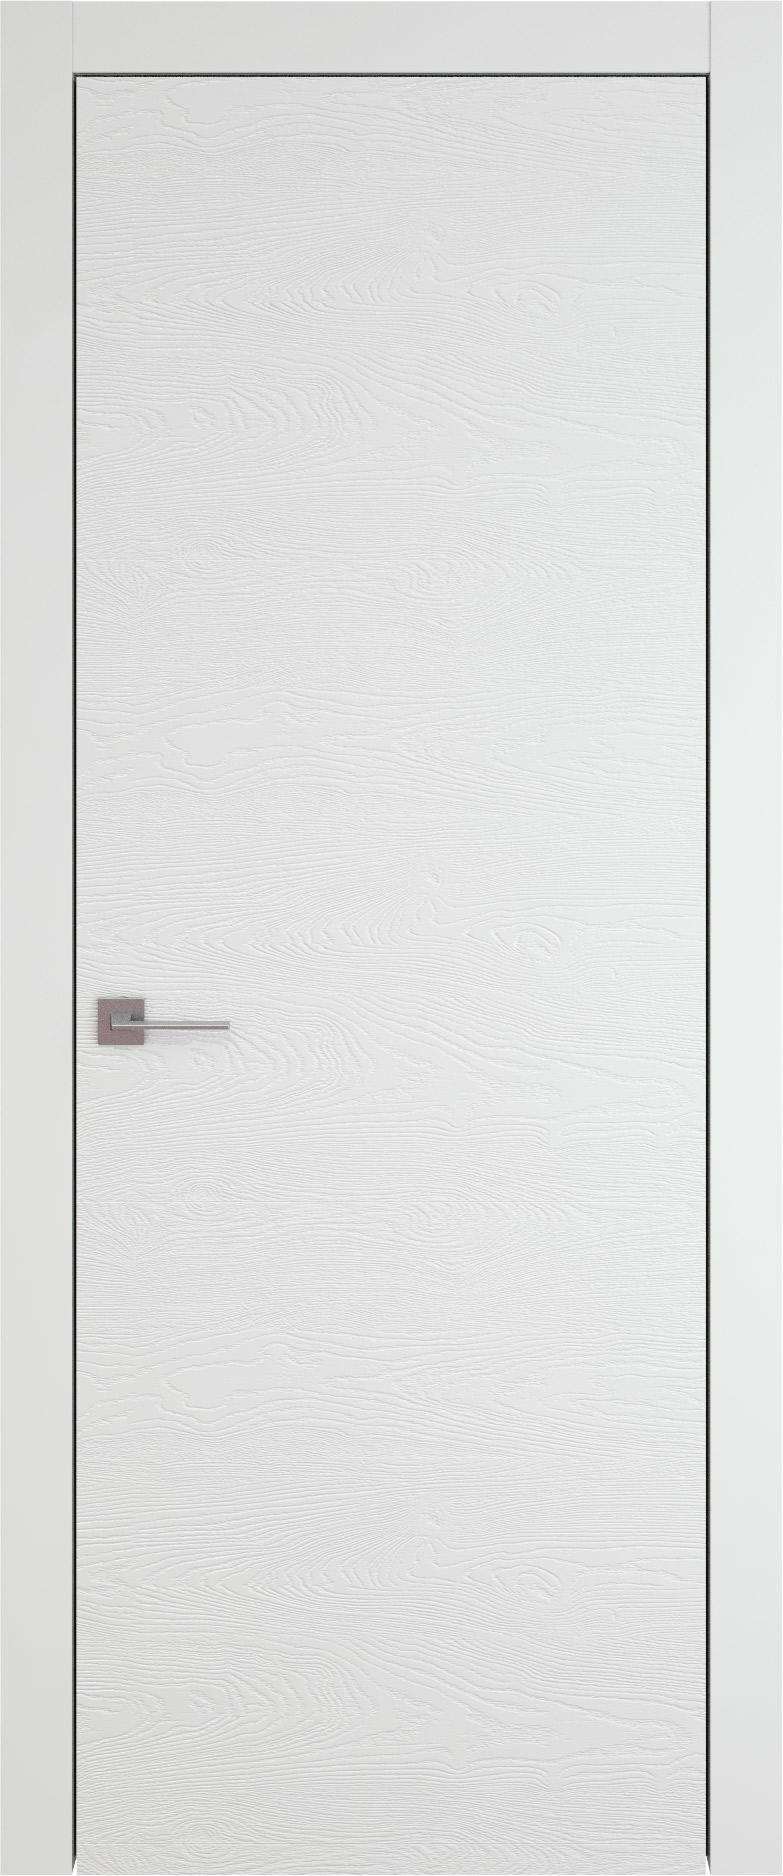 Tivoli А-5 цвет - Белая эмаль по шпону (RAL 9003) Без стекла (ДГ)